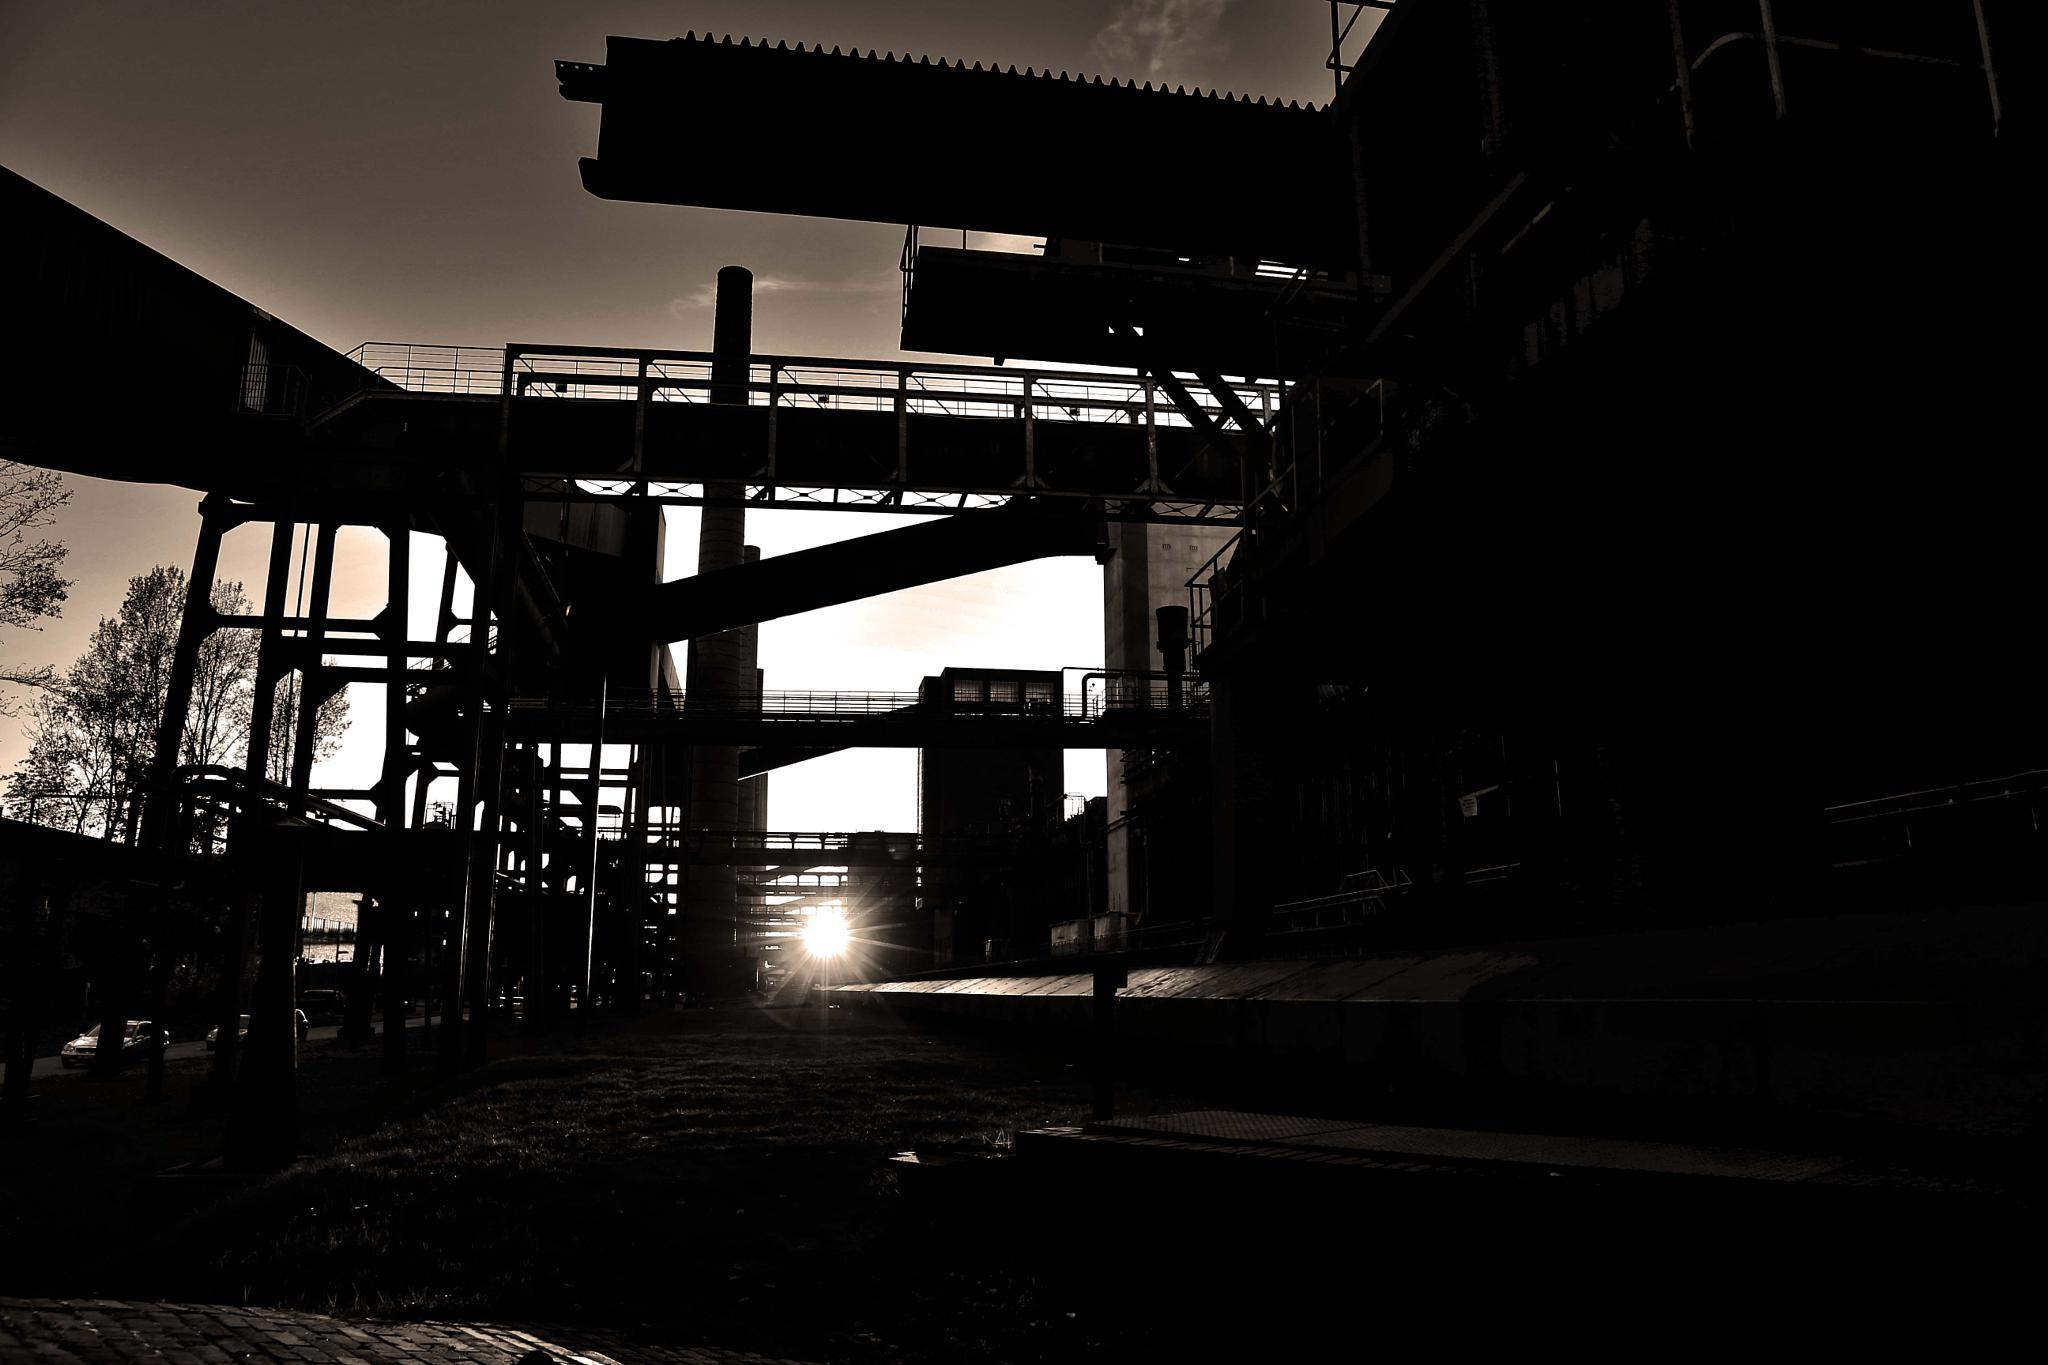 industrial plant by Jürgen Cordt